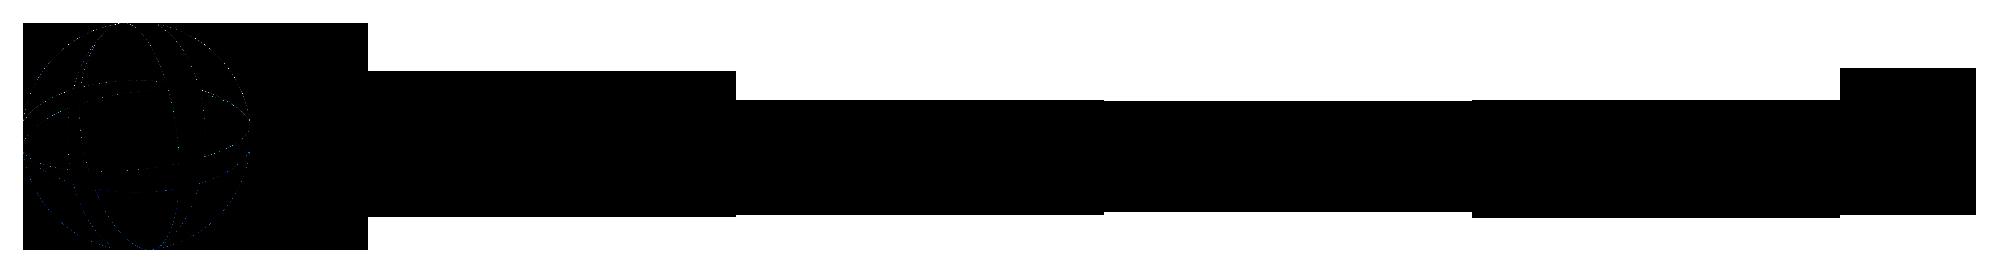 Netzpolitik.org_Logo